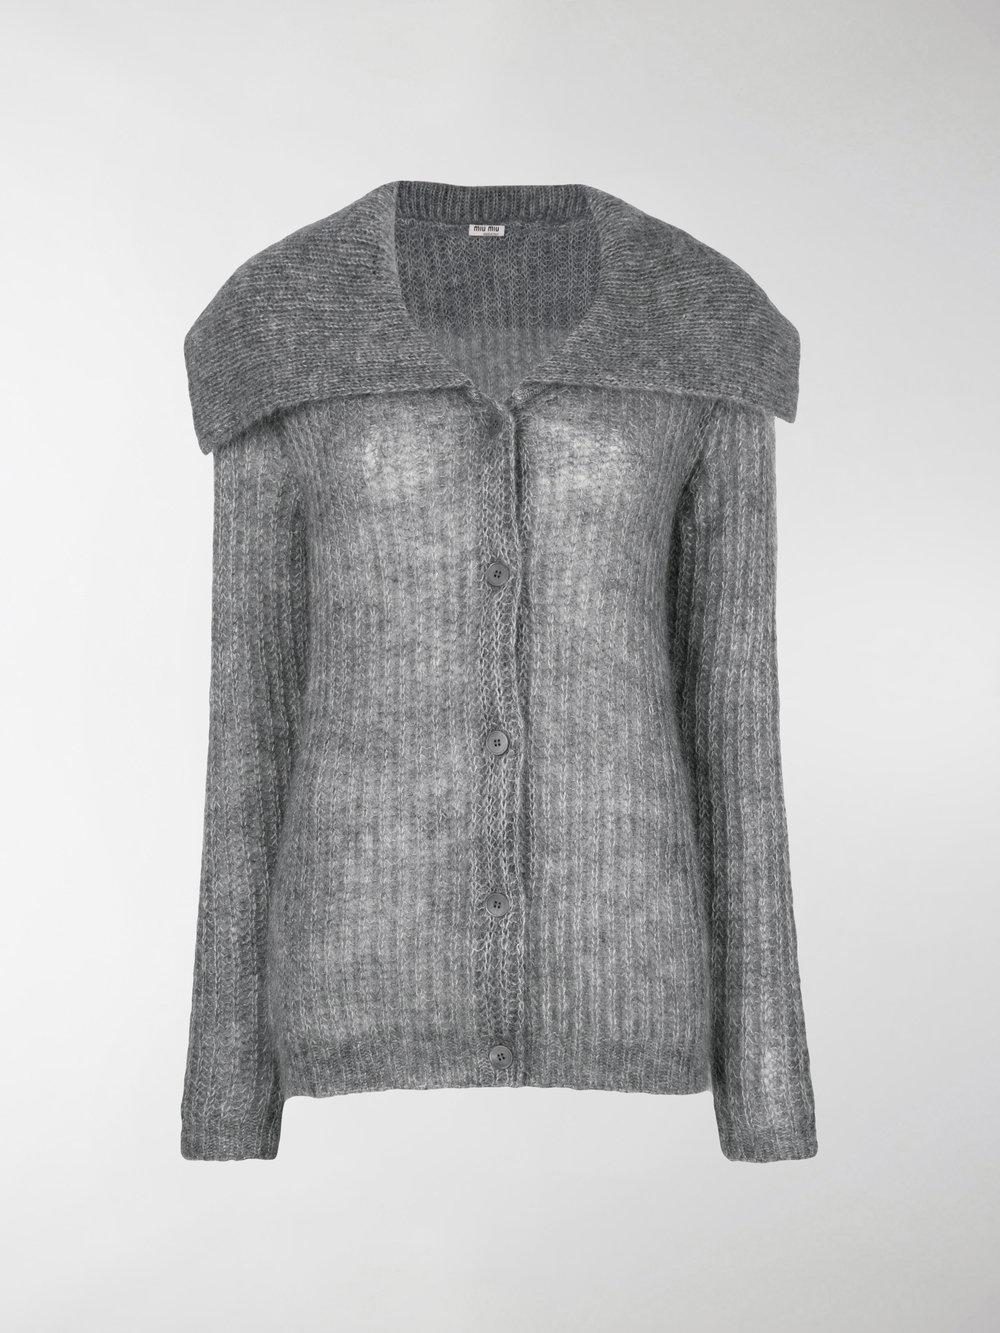 1d3d897408a Lyst - Miu Miu Oversized Collar Cardigan in Gray